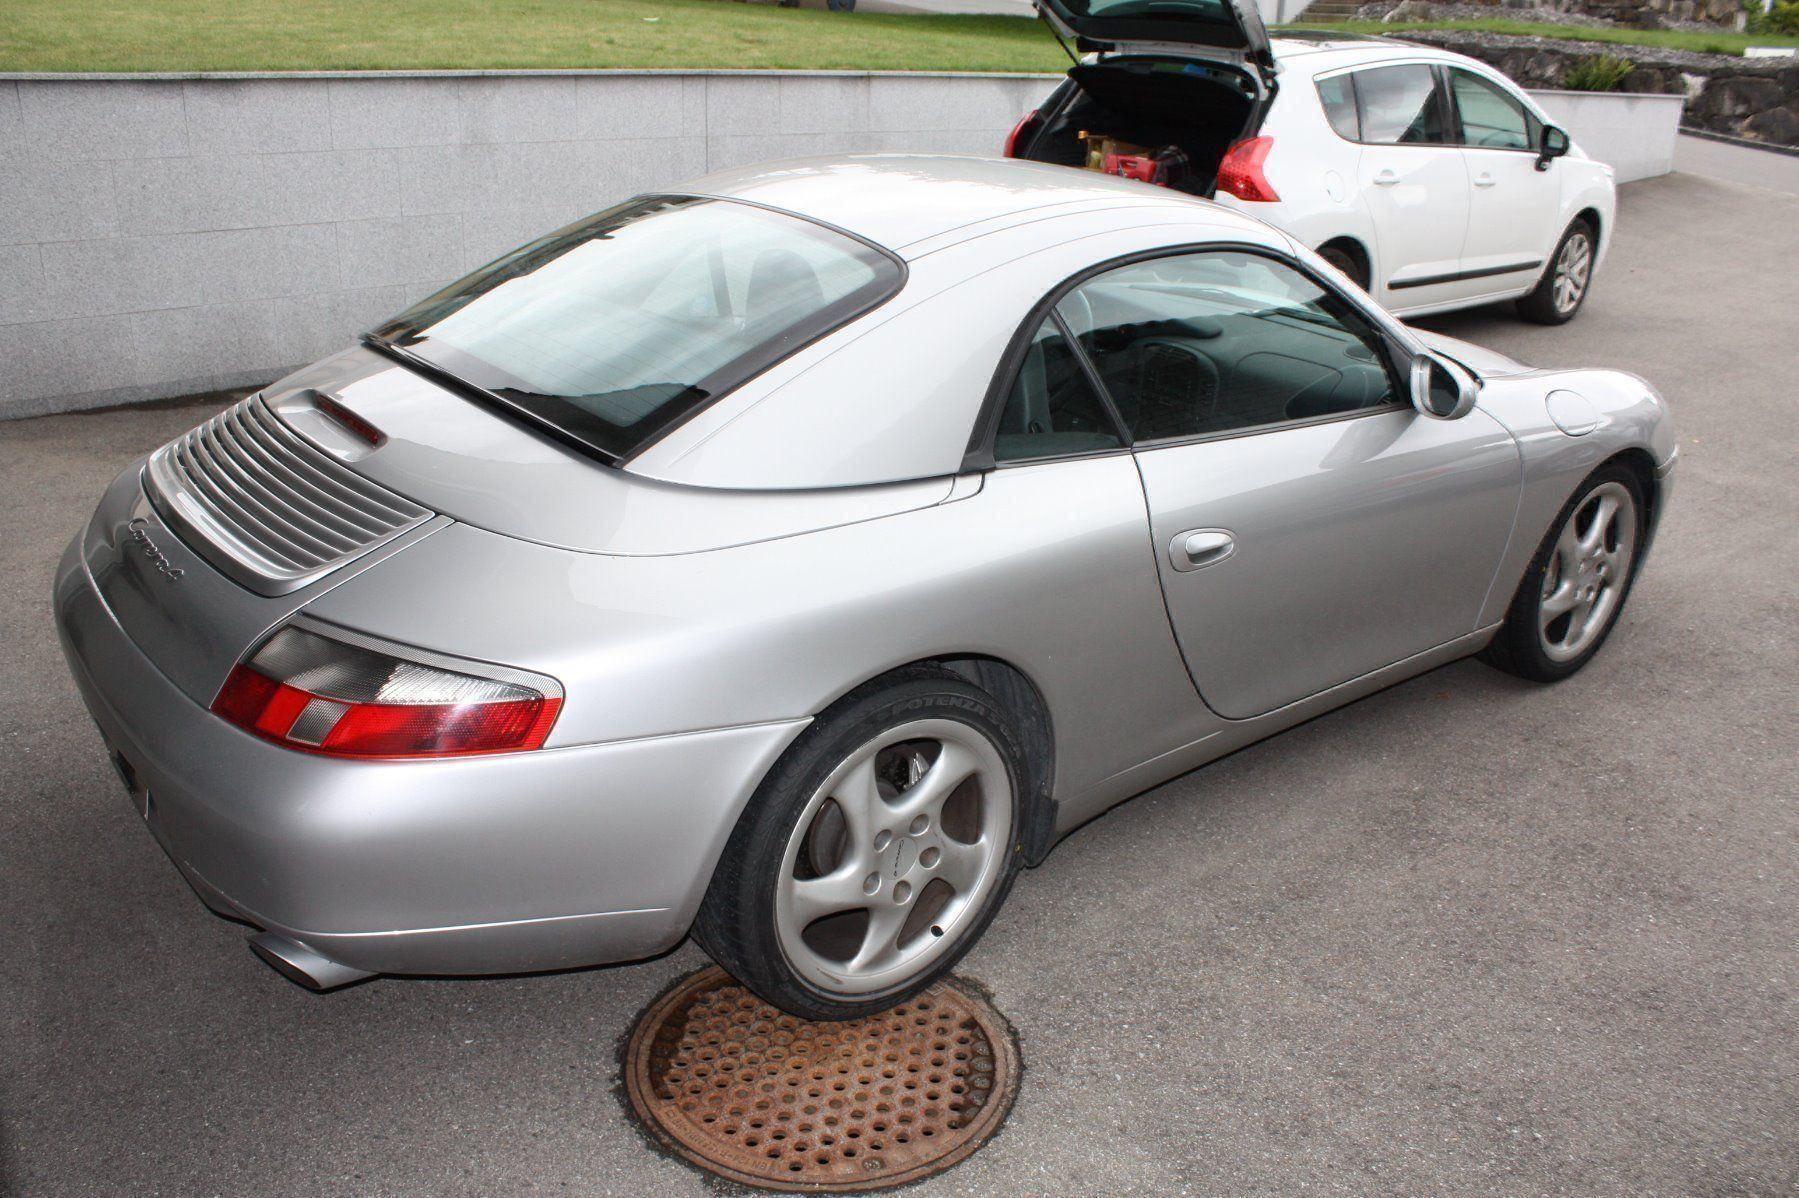 Porsche 911 Cabriolet 3.4 Carrera 4